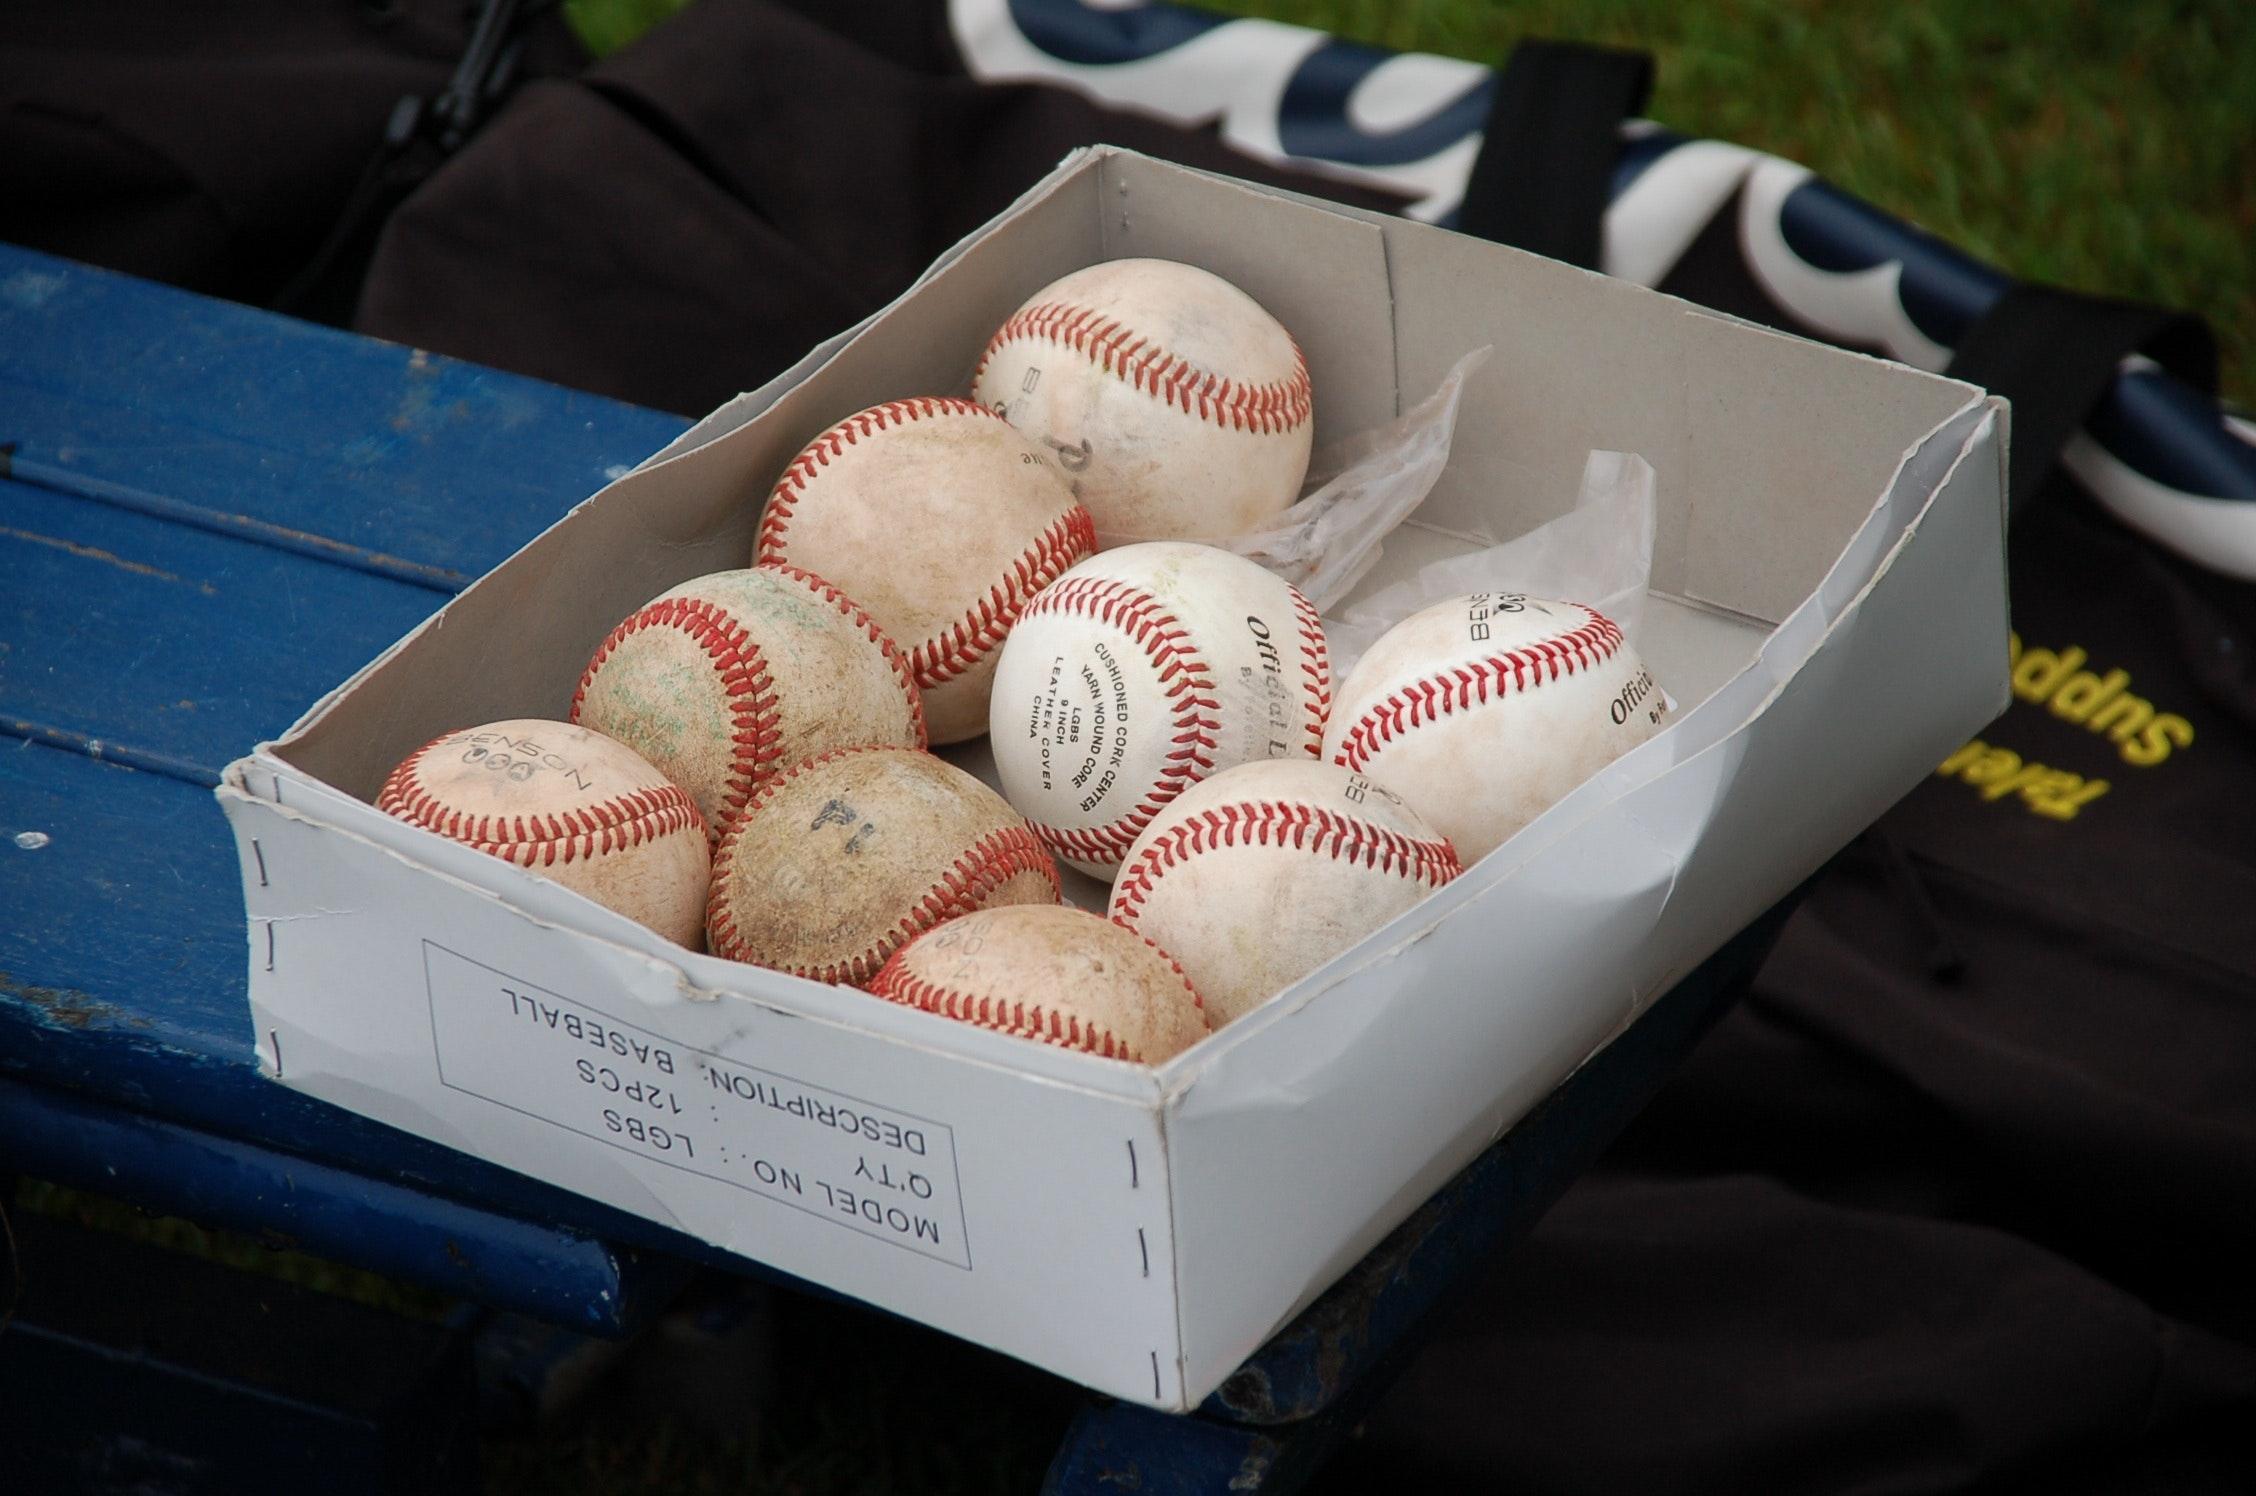 100 ball-baseball-bench-163390.jpg